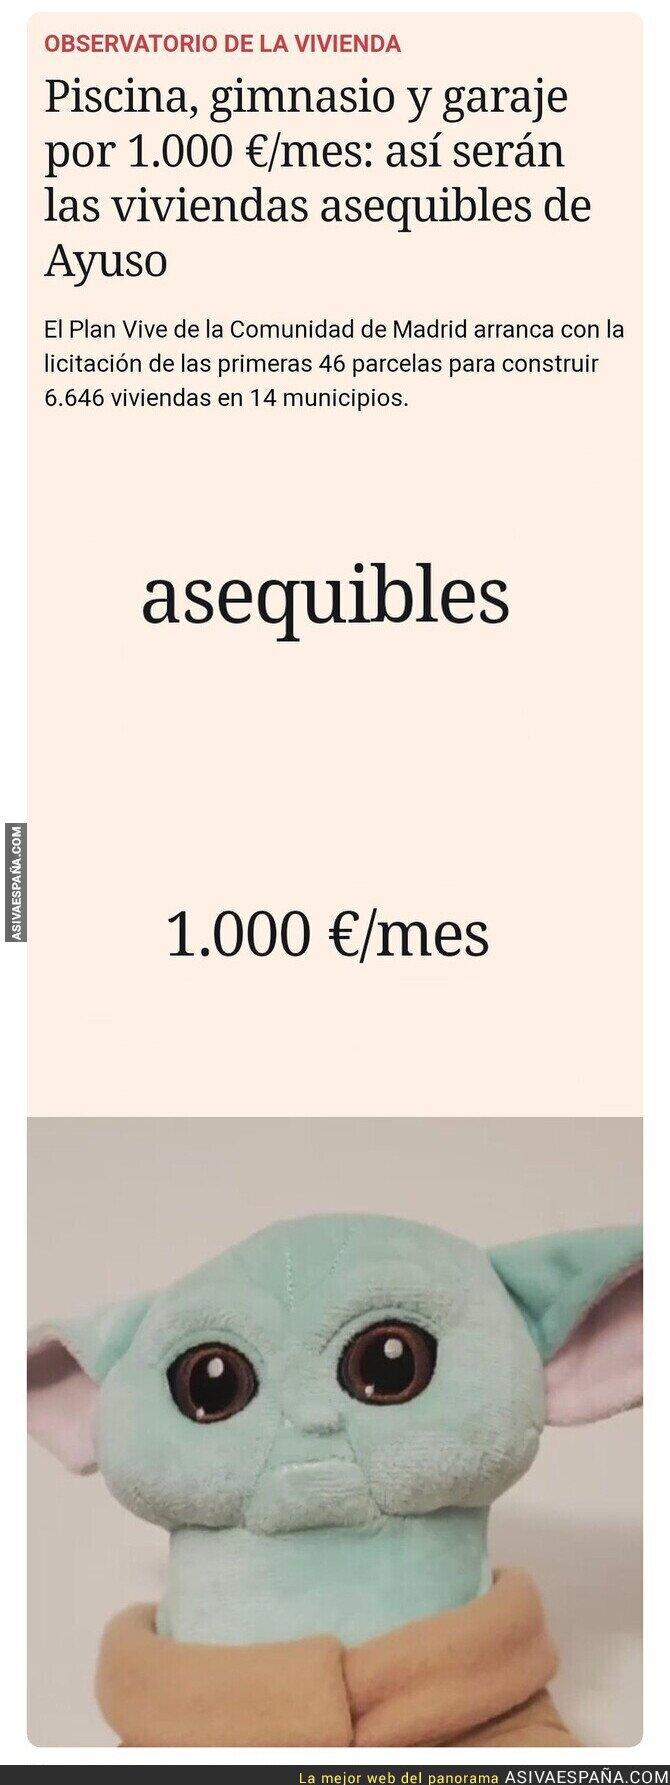 565816 - Como serán las viviendas caras de Ayuso...